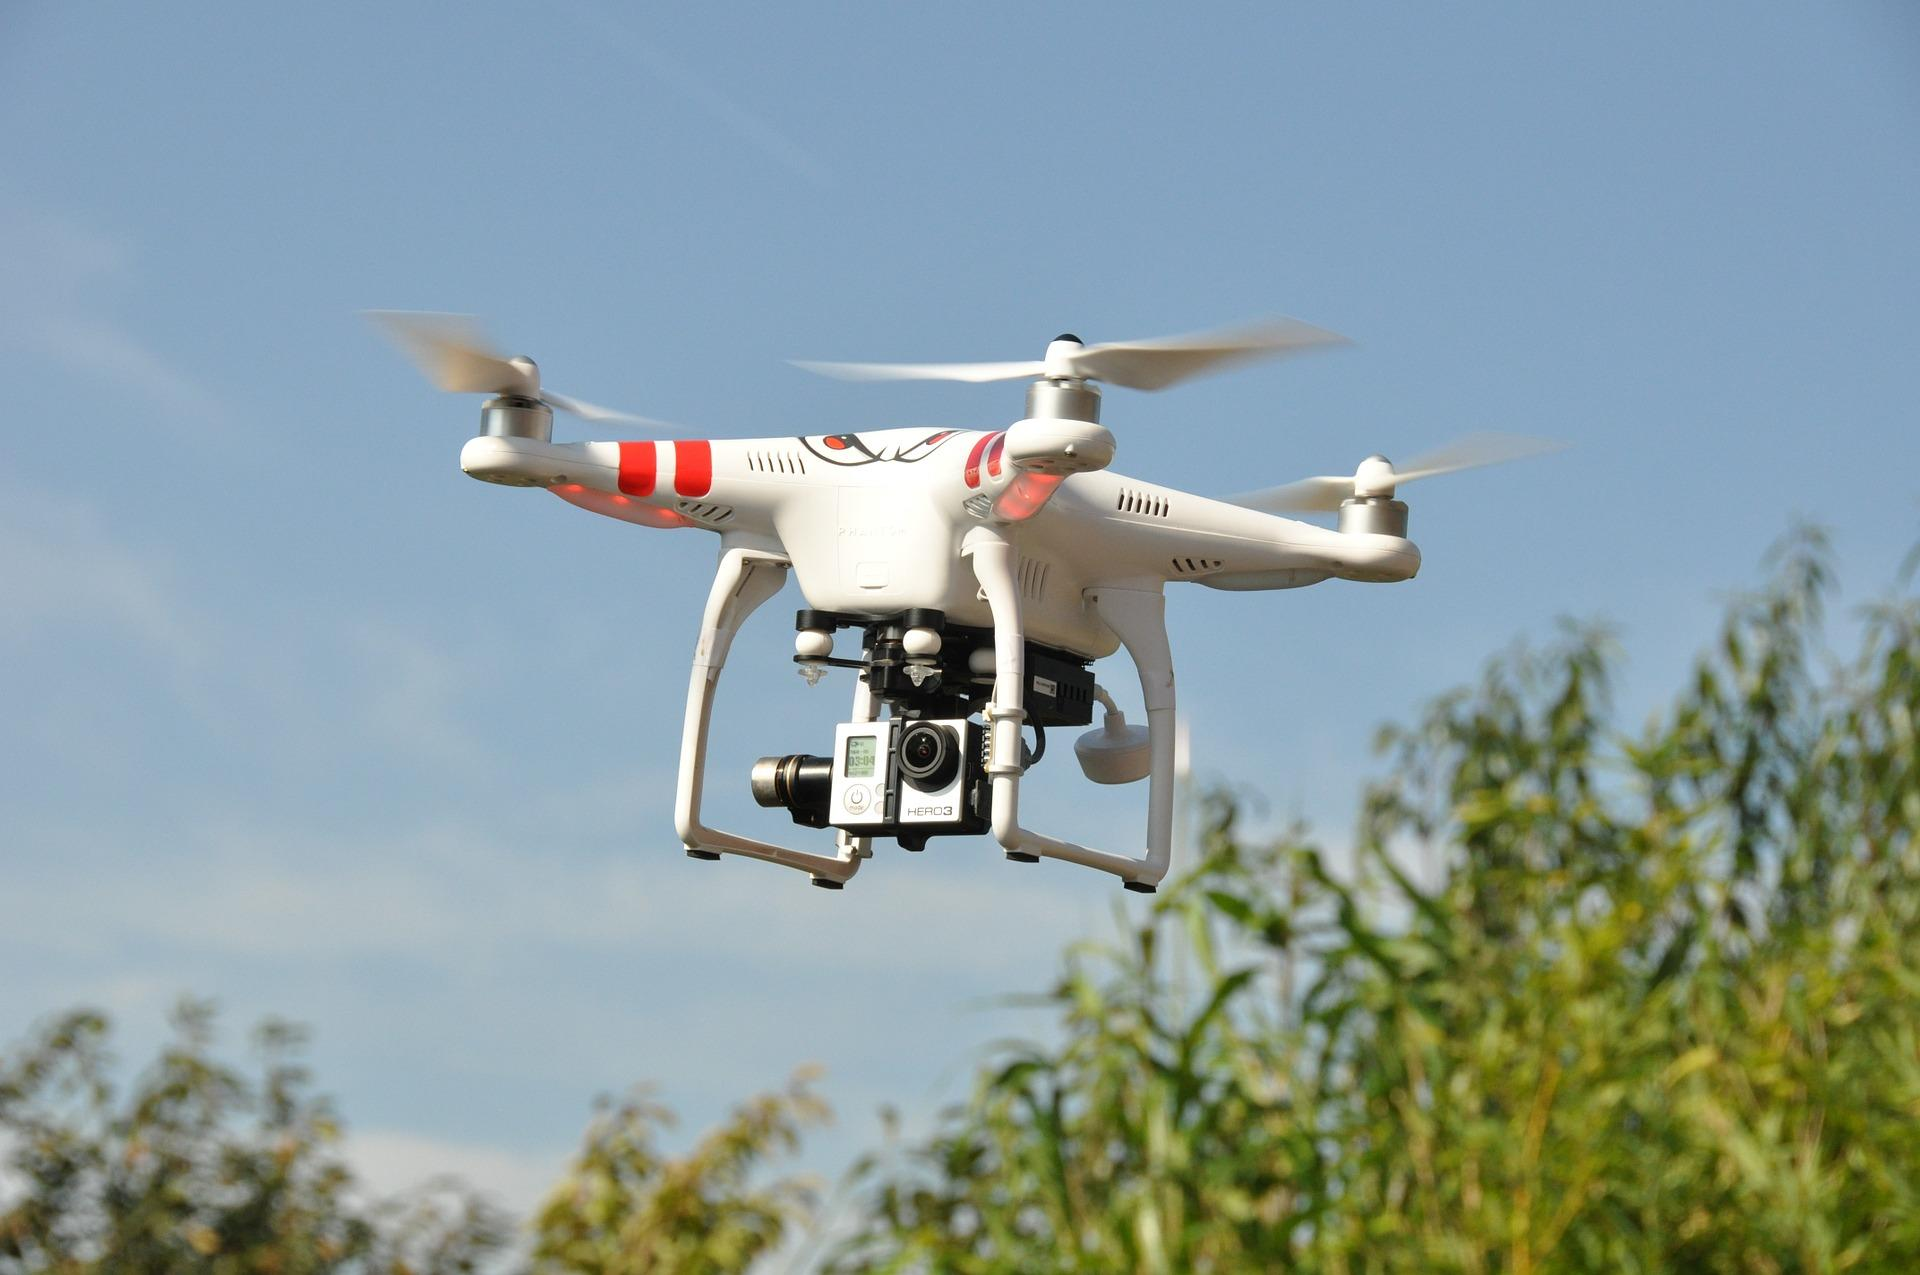 drone-1142182_1920-1494862569957.jpg